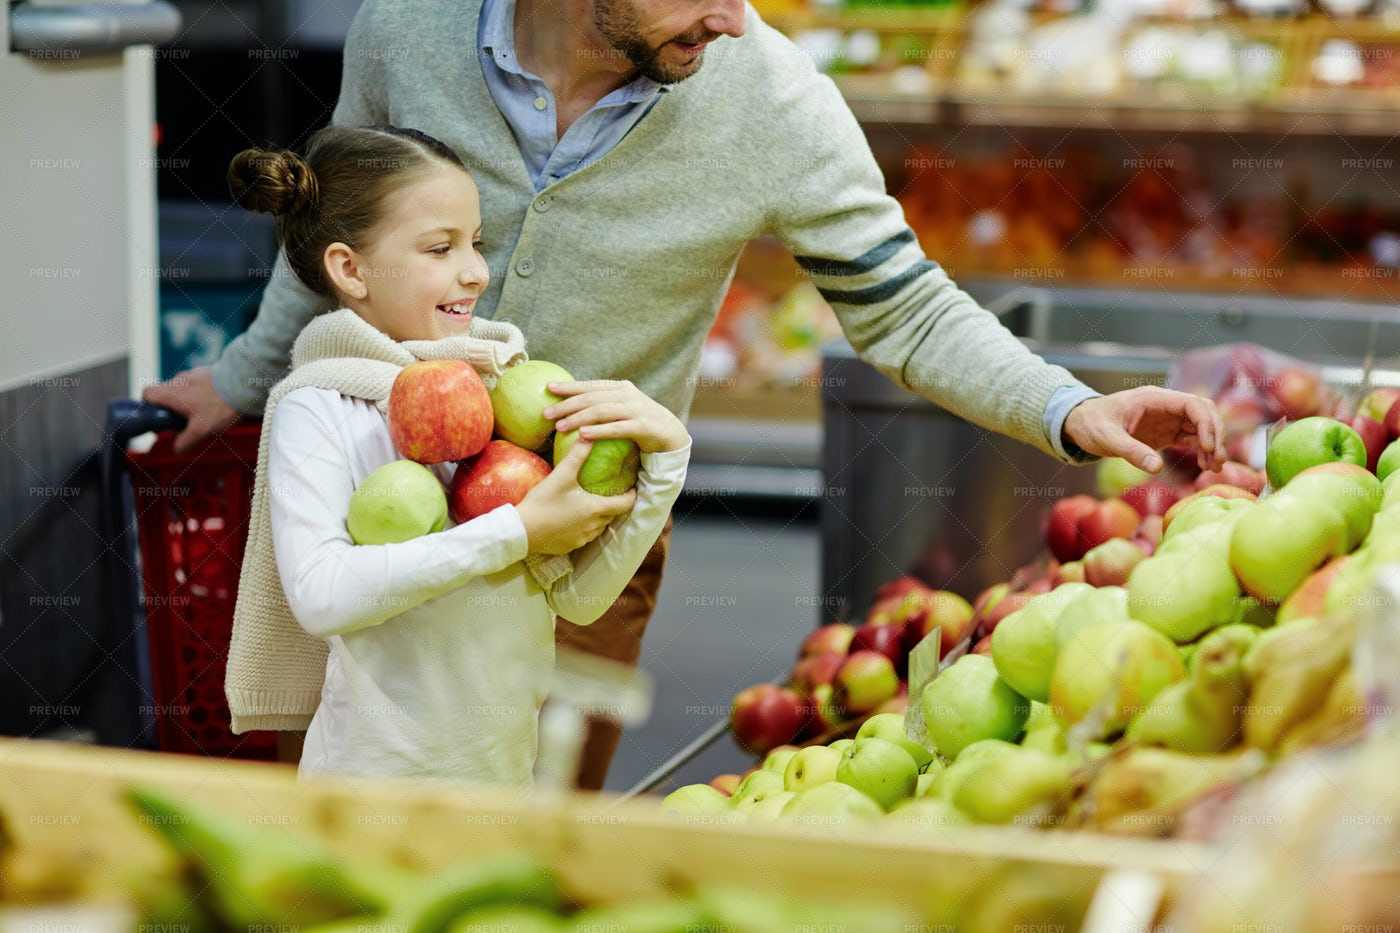 Buying Apples: Stock Photos